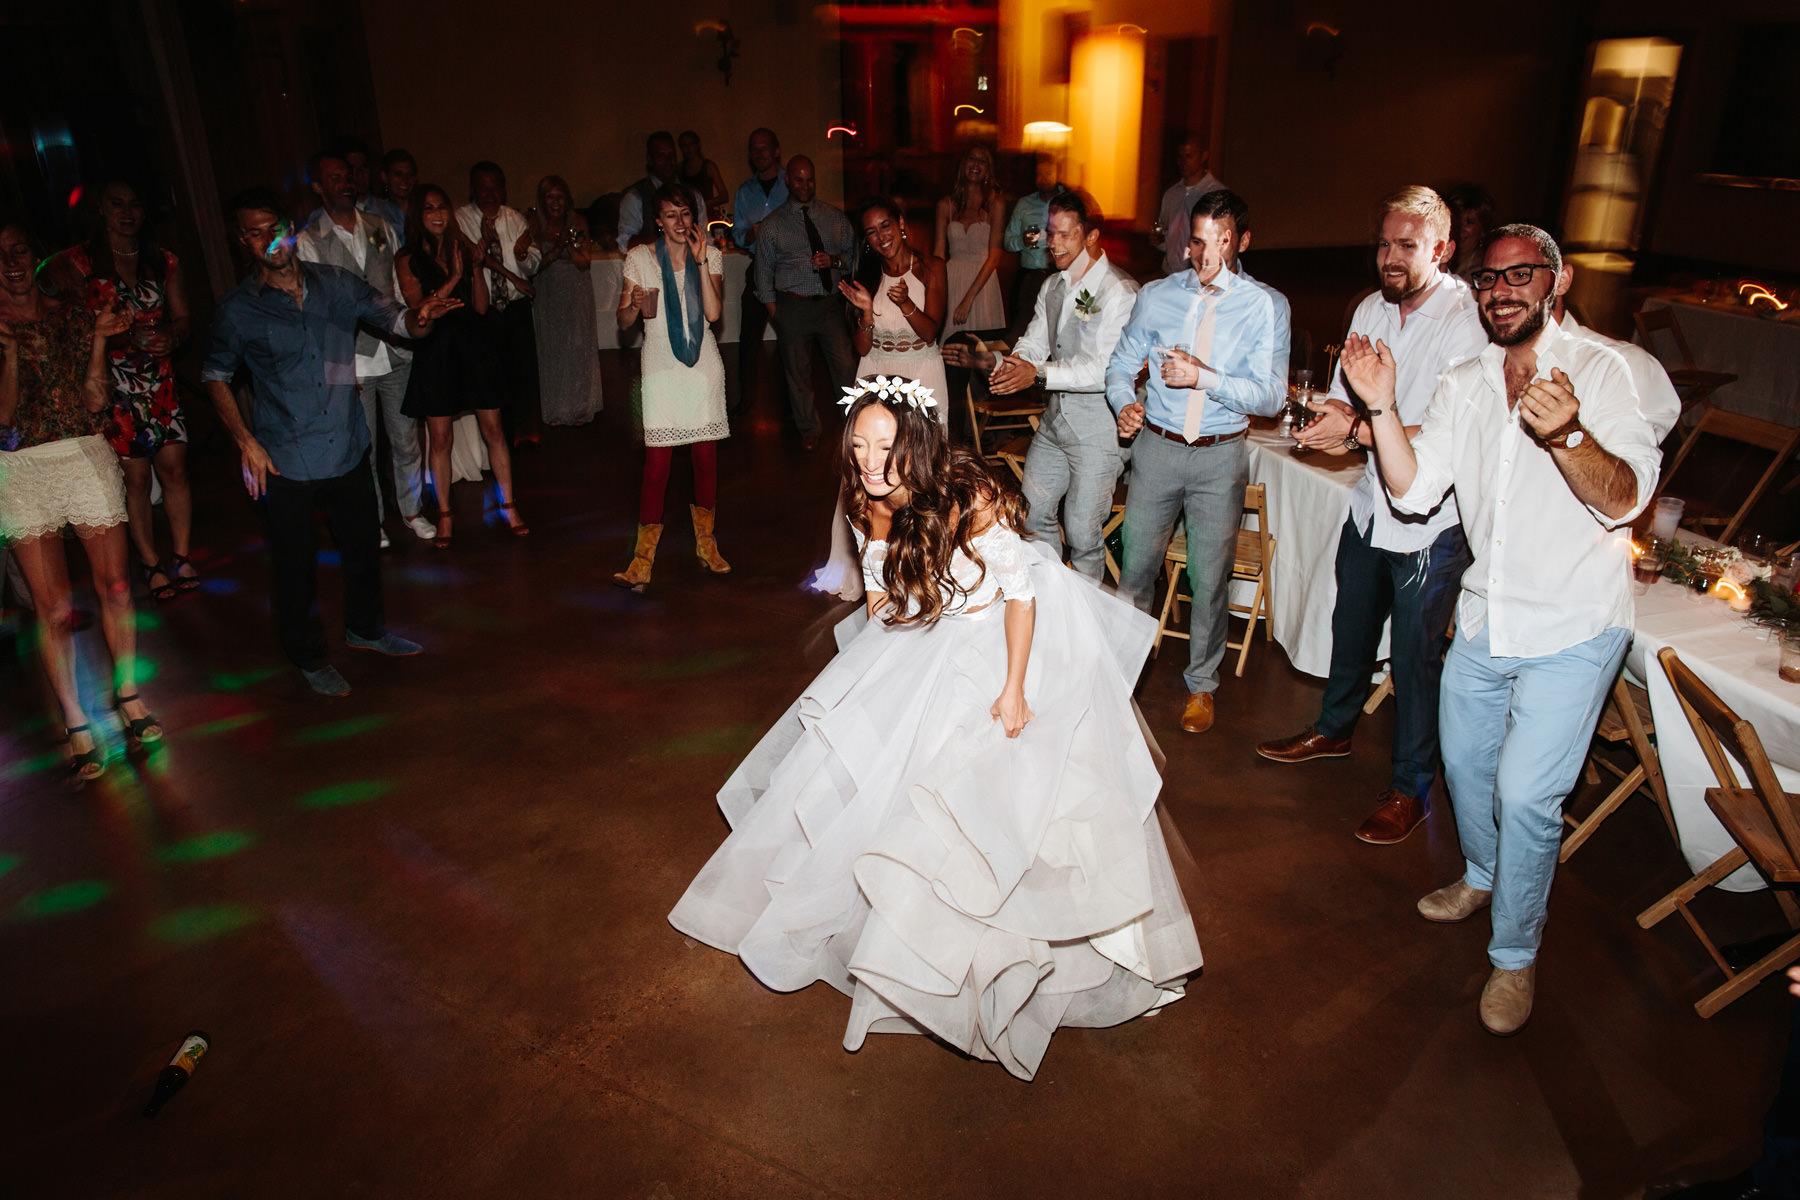 Vail Colorado Wedding Deck_ Kindling Wedding Photography103.JPG